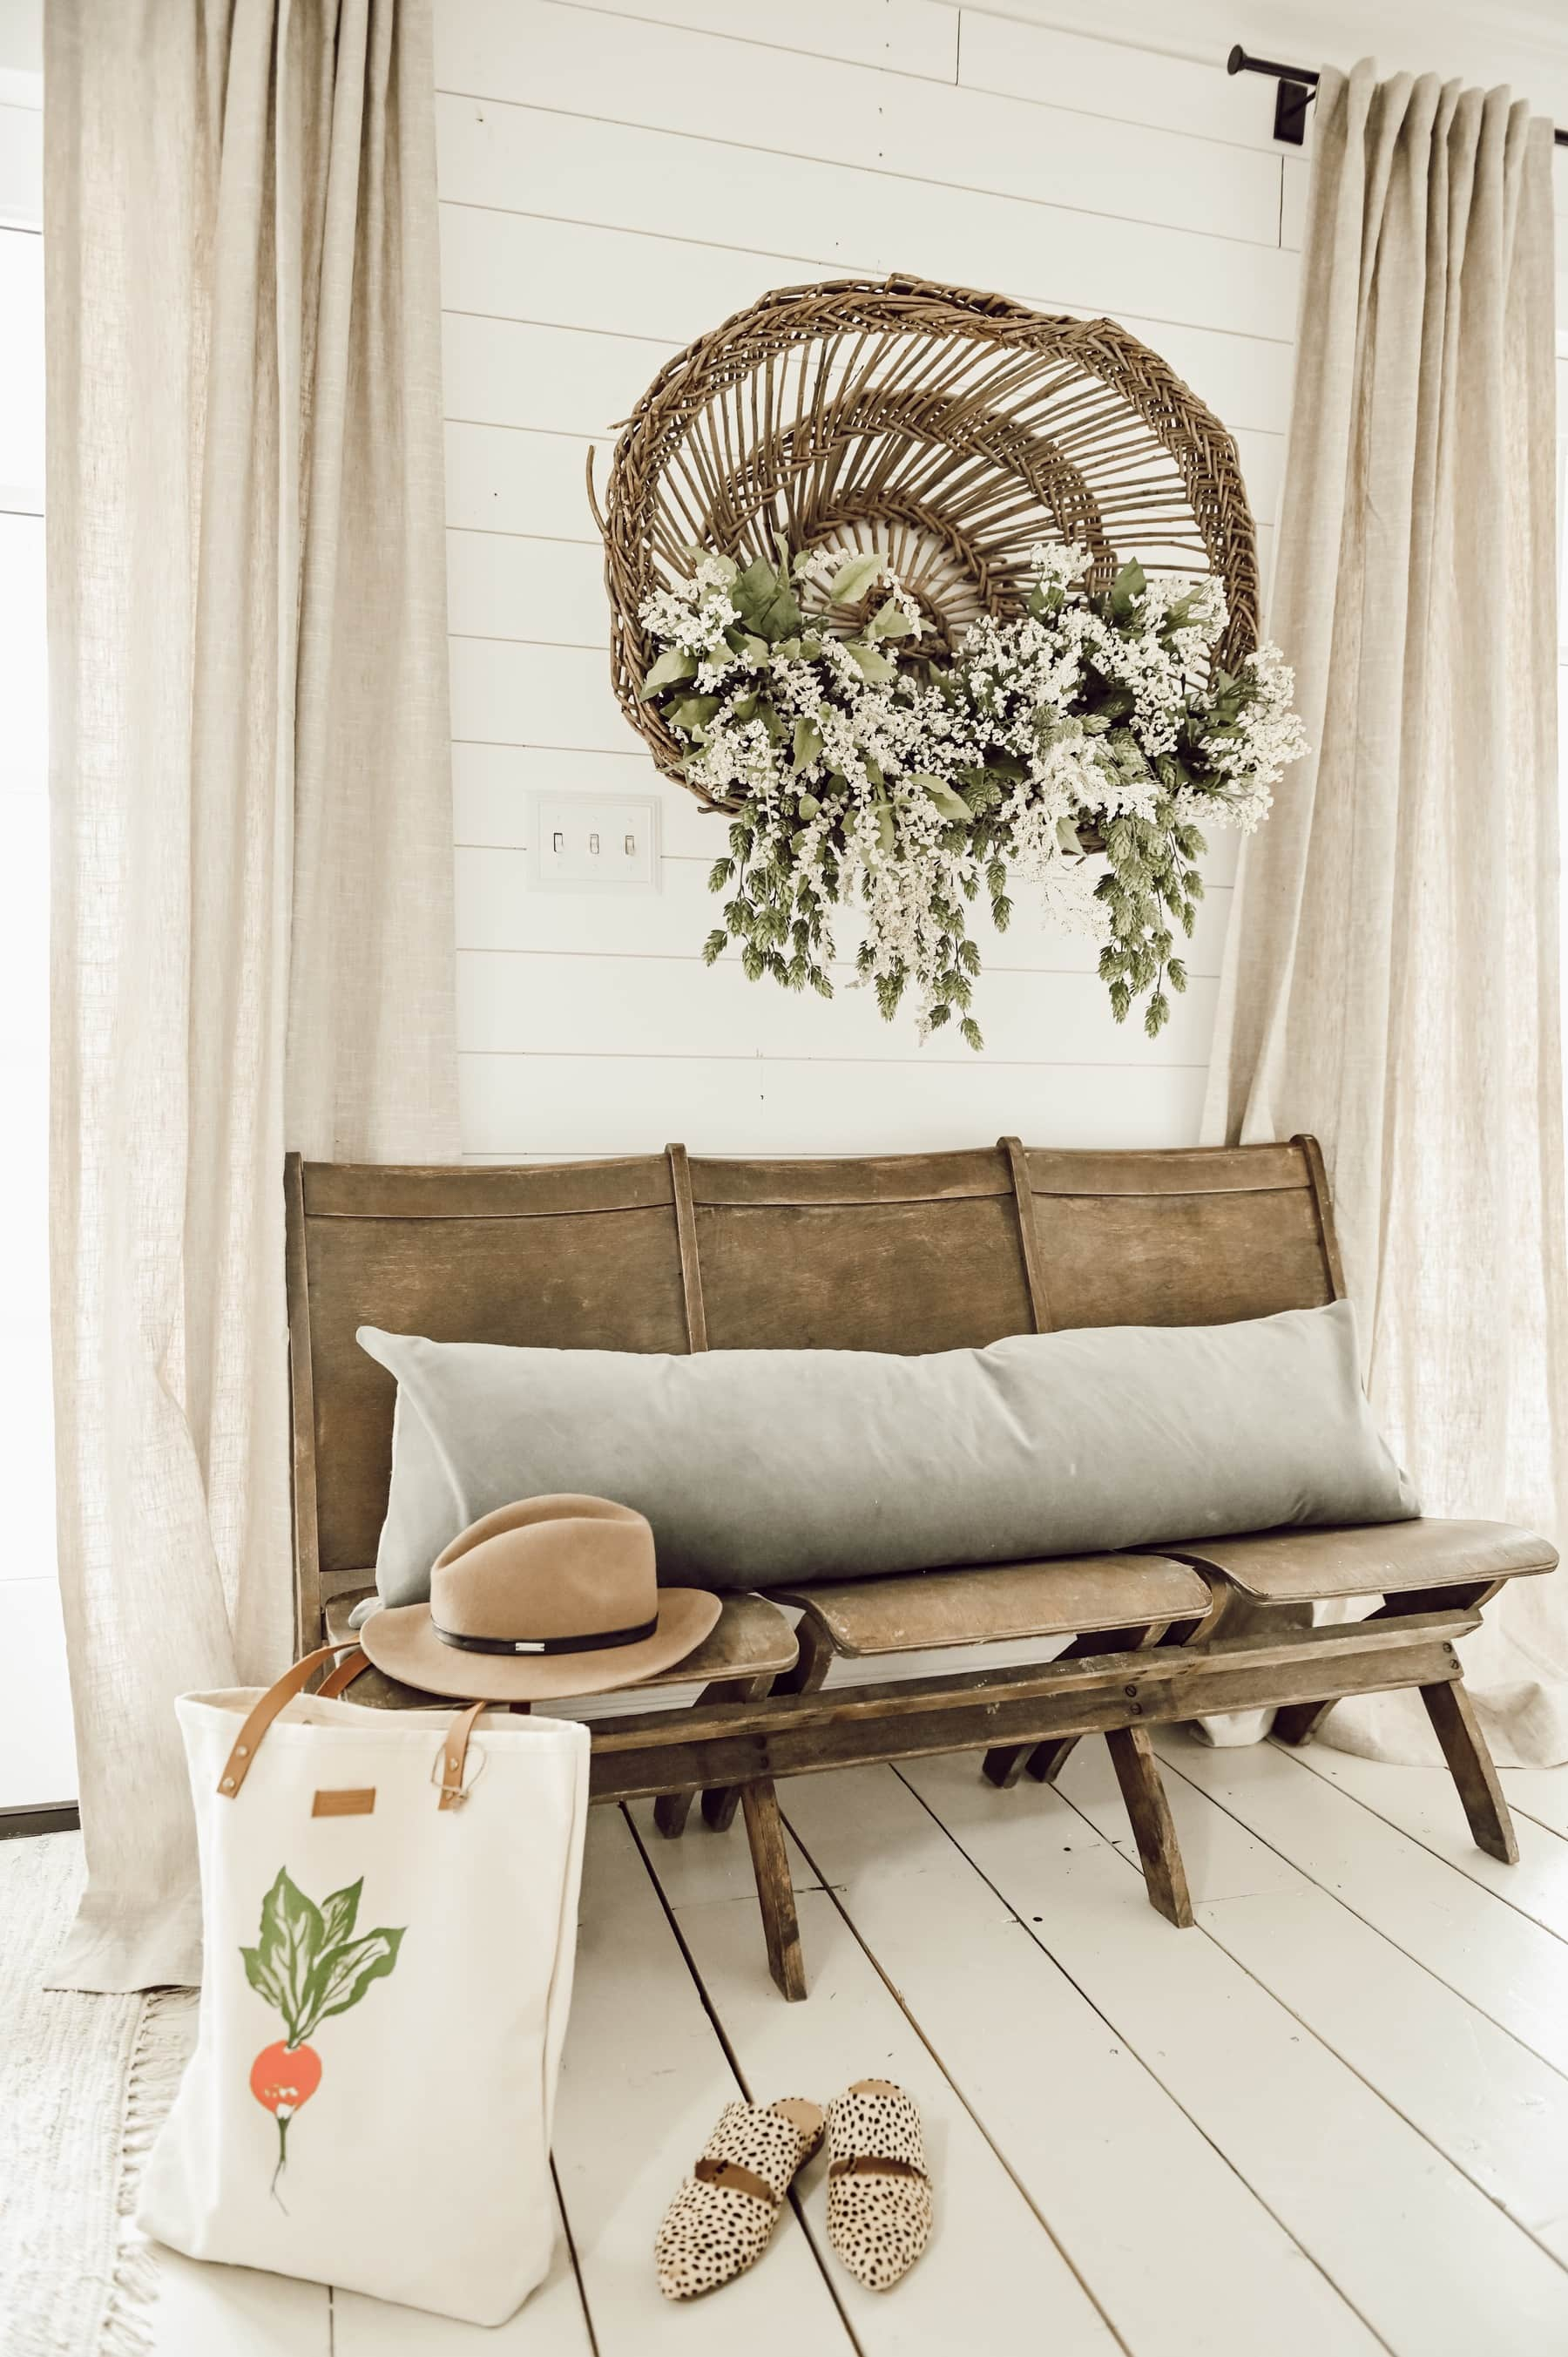 Hanging Floral Basket, Hanging Floral Basket Art